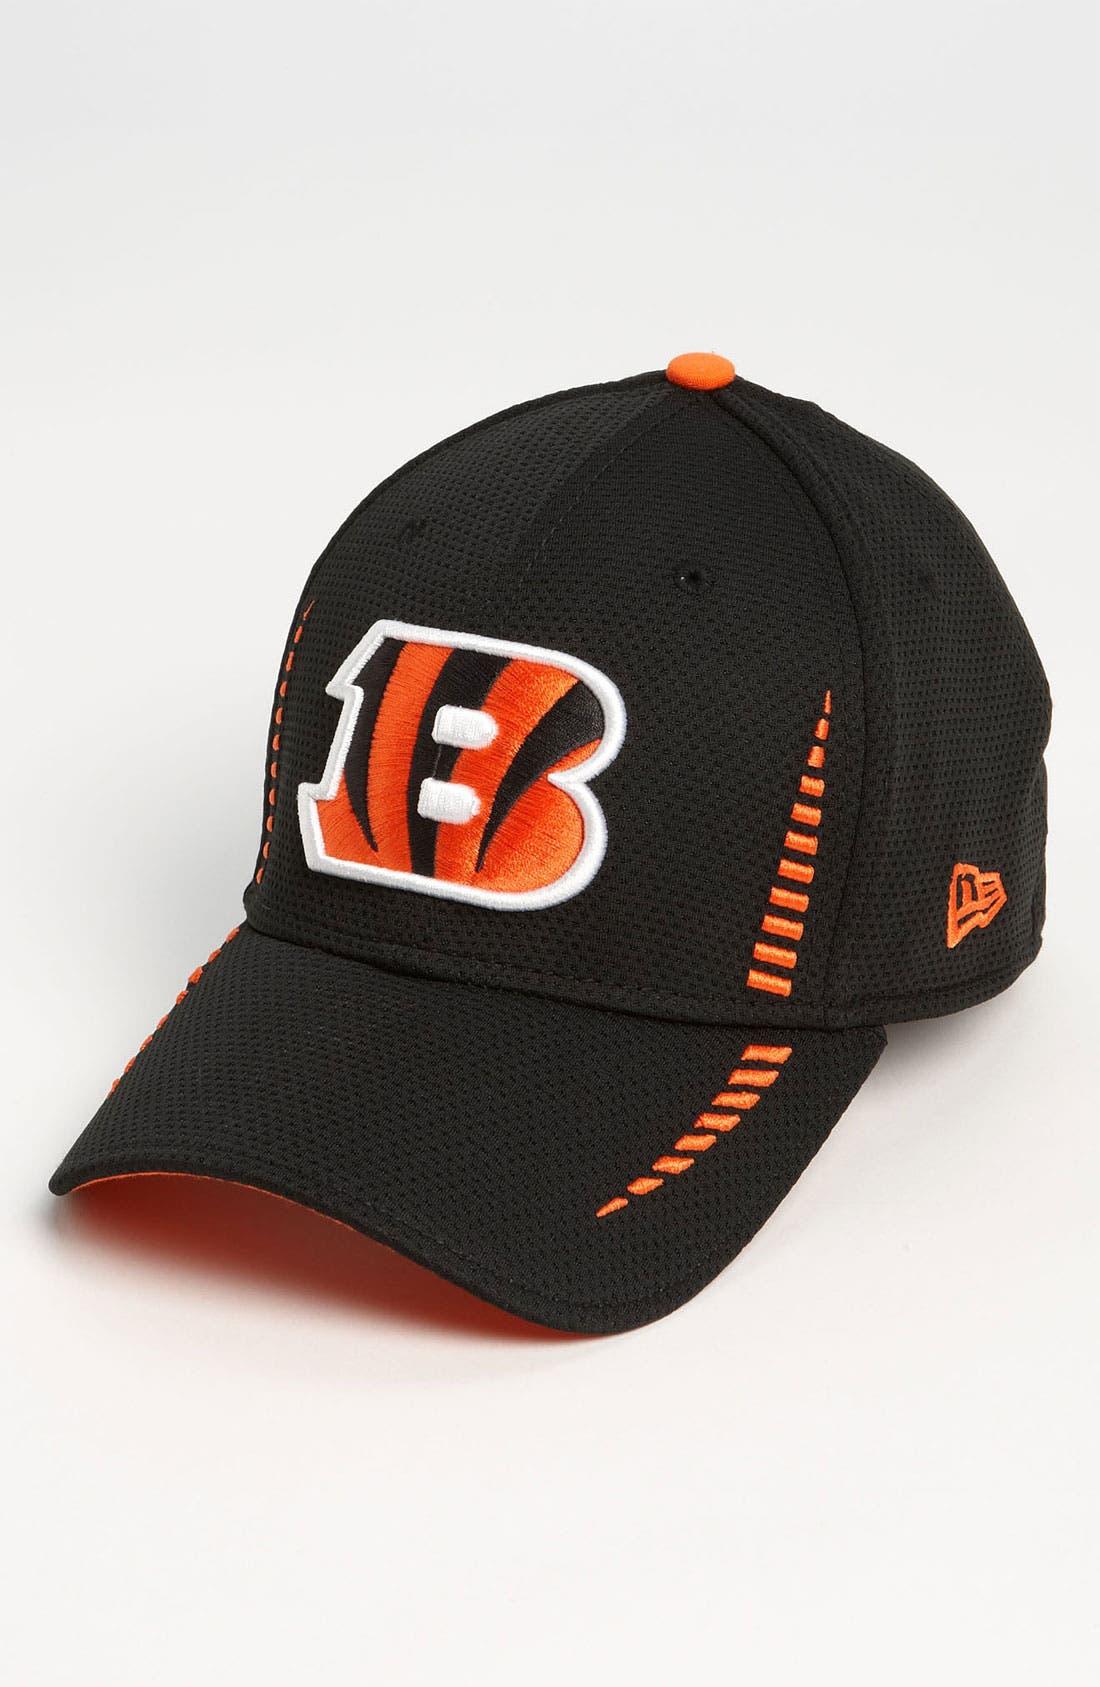 Alternate Image 1 Selected - New Era Cap 'Training Camp - Cincinnati Bengals' Baseball Cap